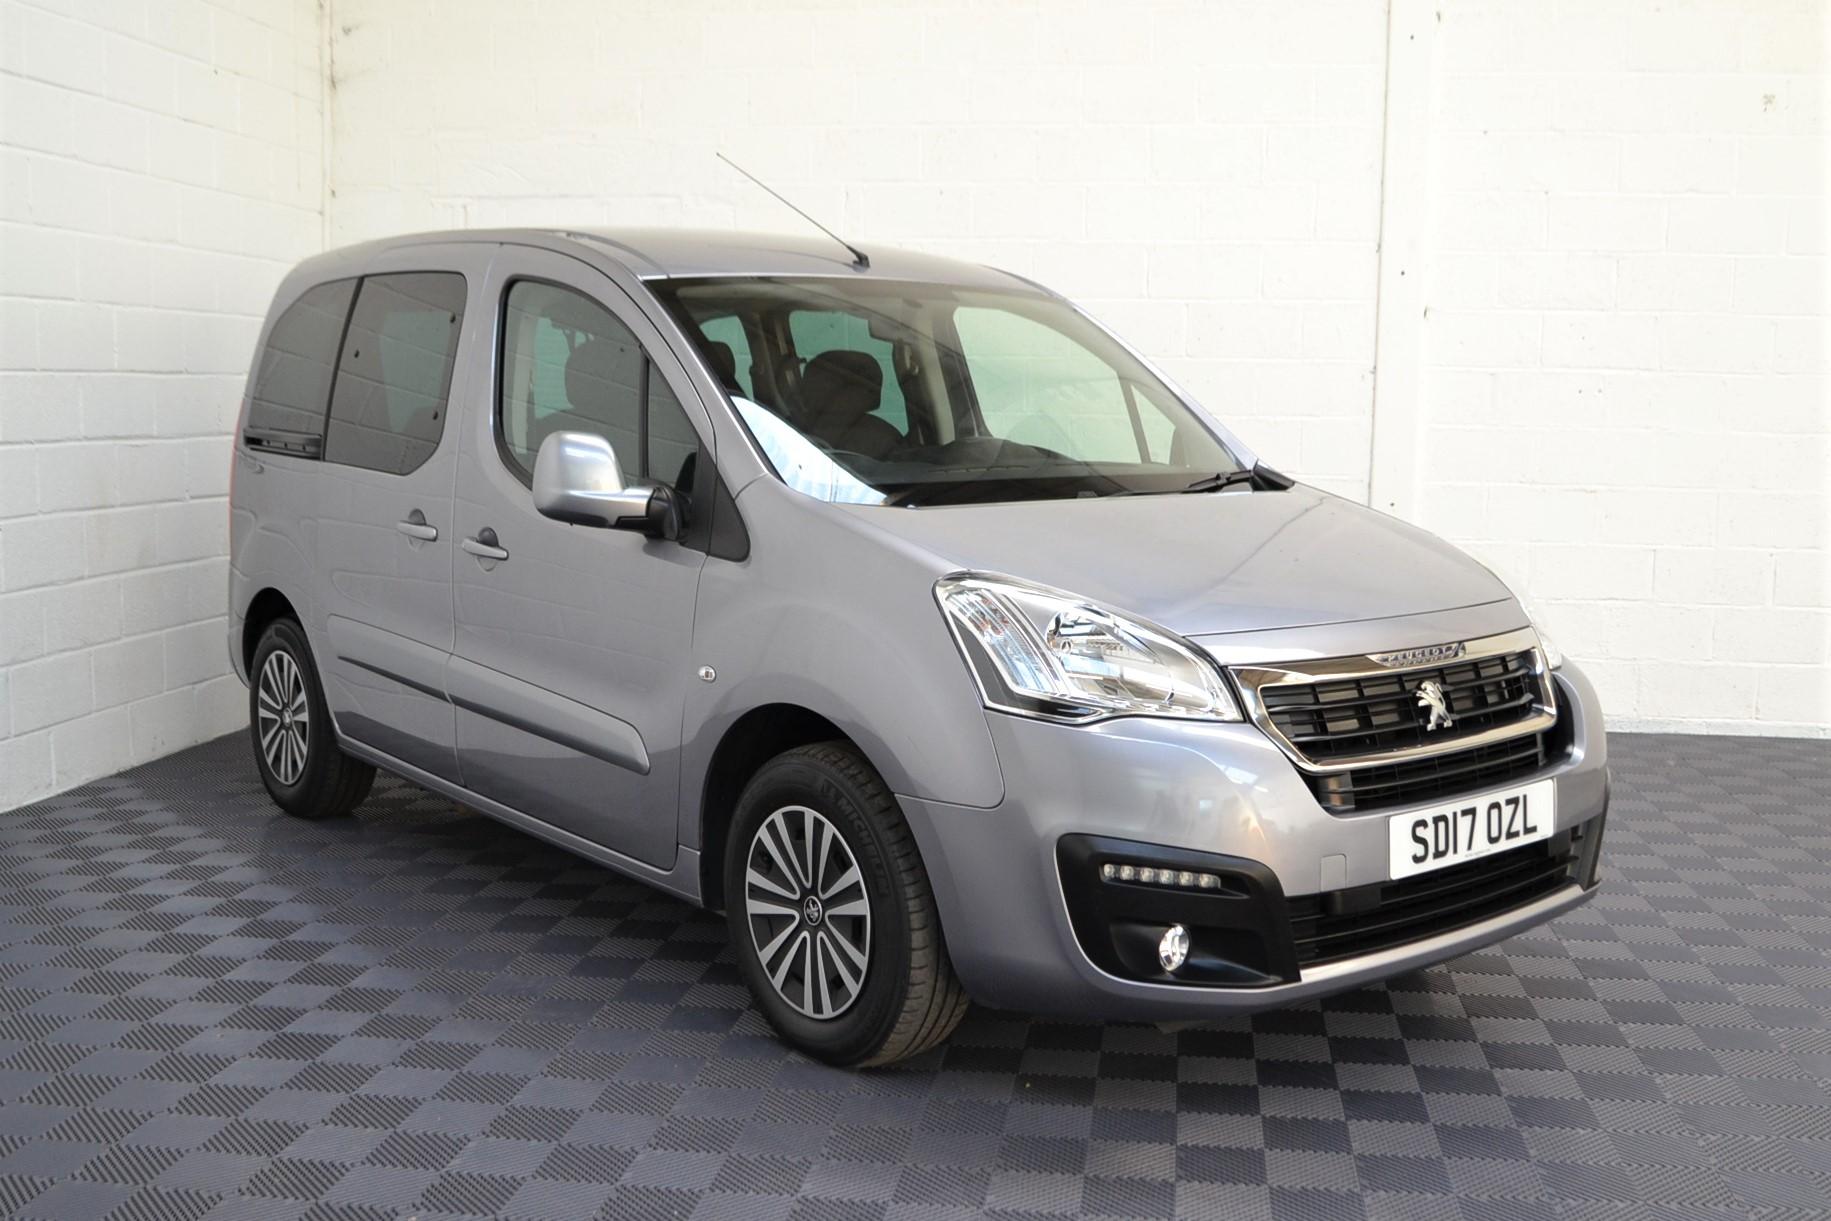 WAV Cars For Sale Bristol Wheelchair Accessible Vehicles Used For Sale Somerset Devon Dorset Bath Peugeot Partner SD17 OZL 18